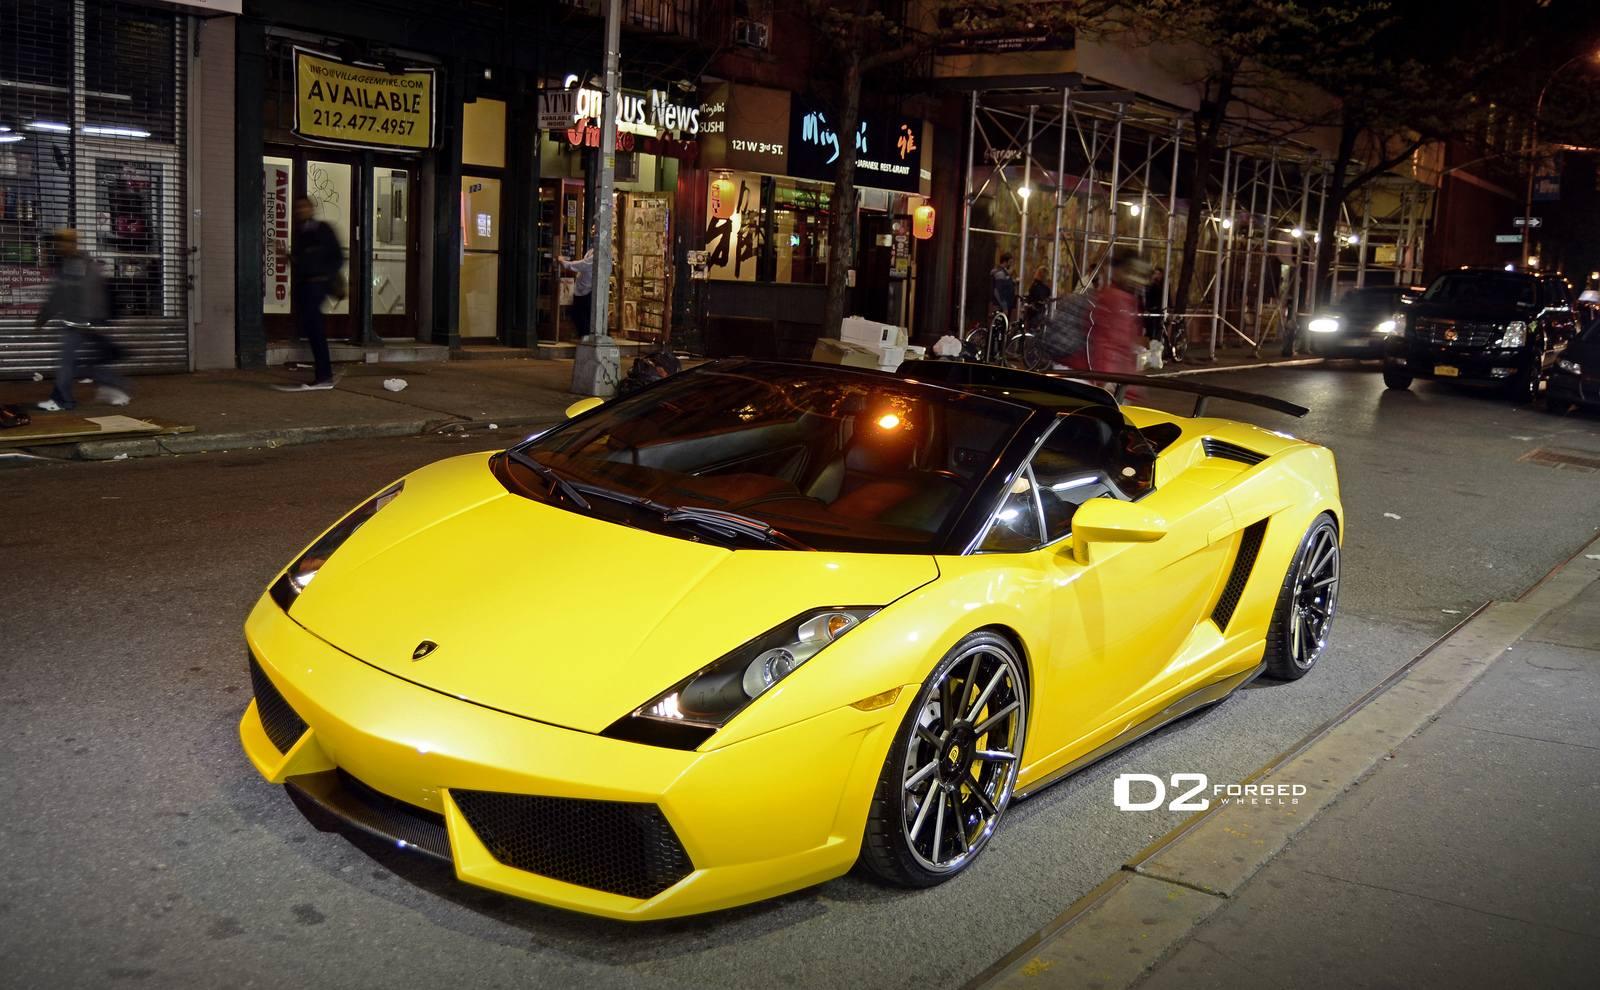 http://www.gtspirit.com/wp-content/gallery/gallery-lamborghini-gallardo-d2forged-wheels-nighttime/lamborghini-gallardo-d2forged-cv11-image-06.jpg